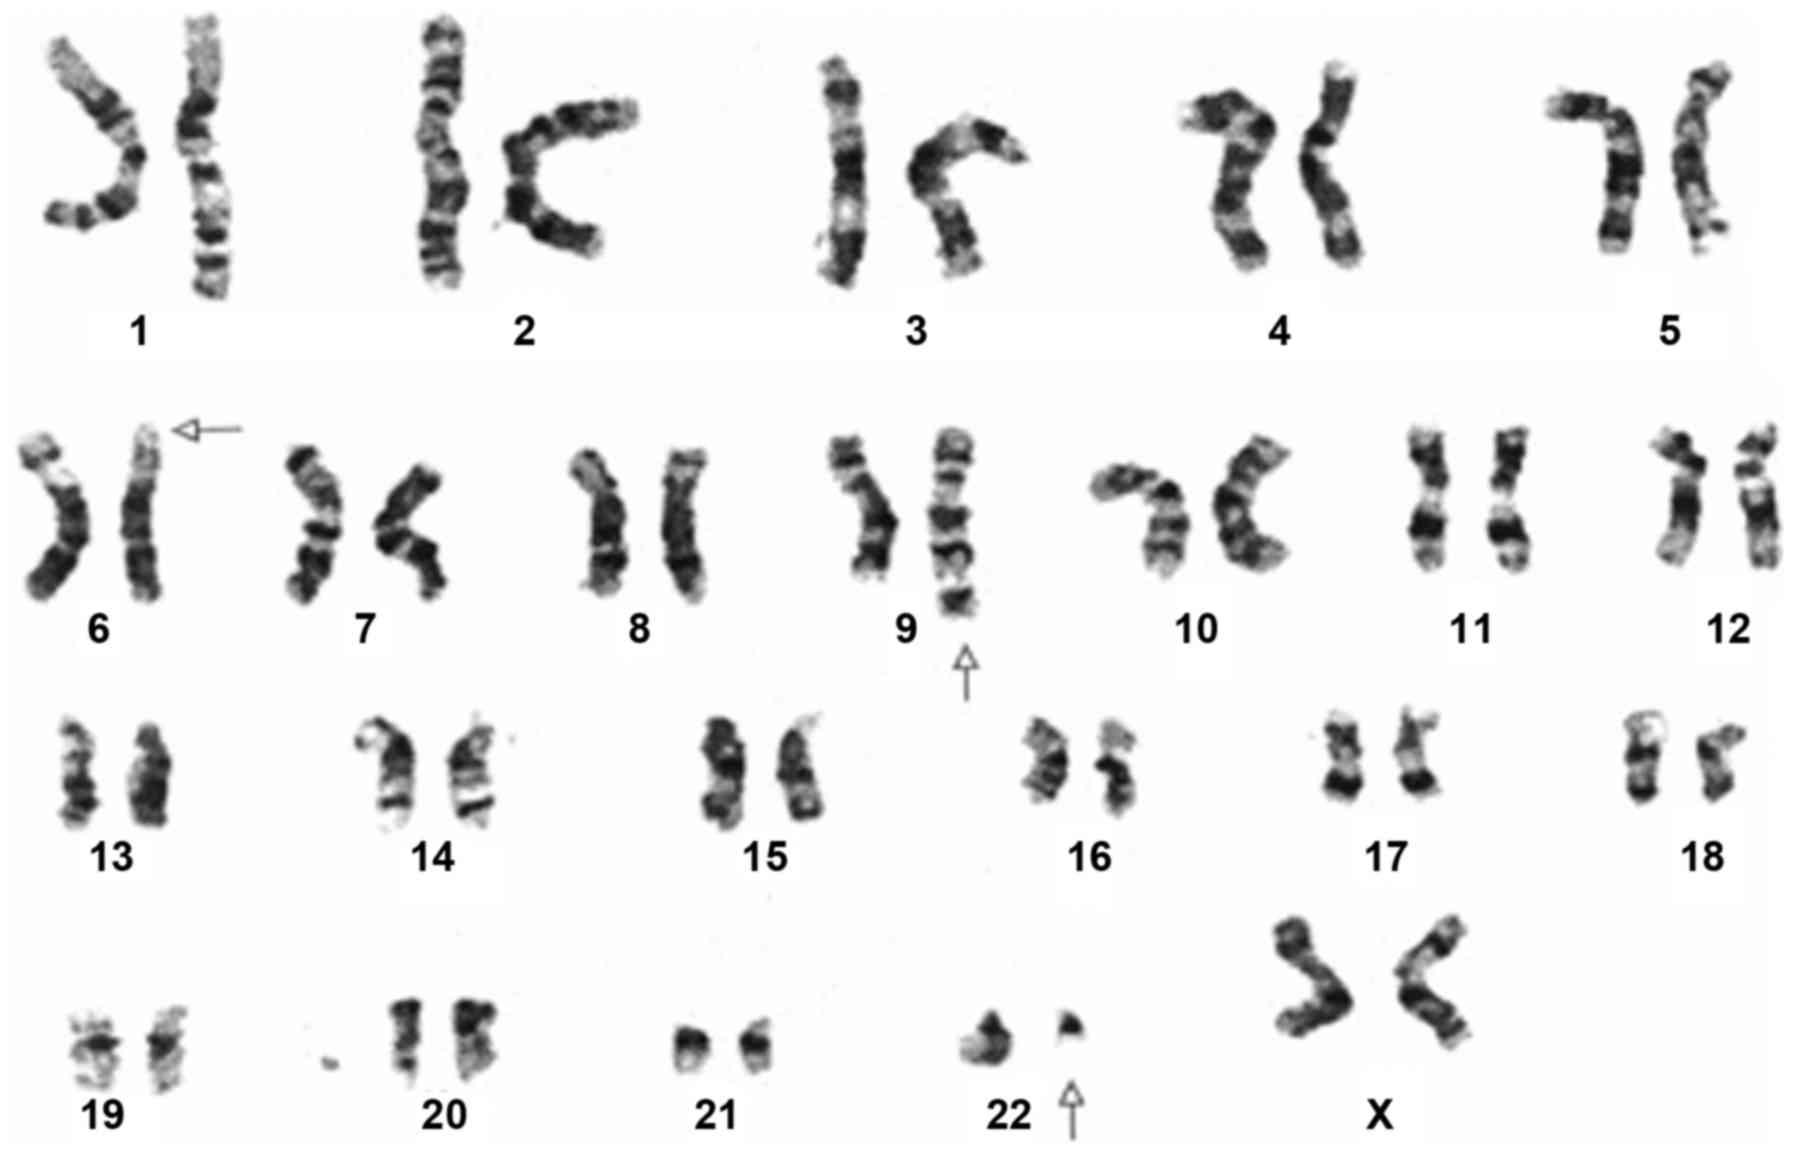 Cytogenetic Analysis Shows A Variant Three Way Translocation 46XXt6922p21q34q11 Arrowheads Highlight All The Derivative Chromosomes